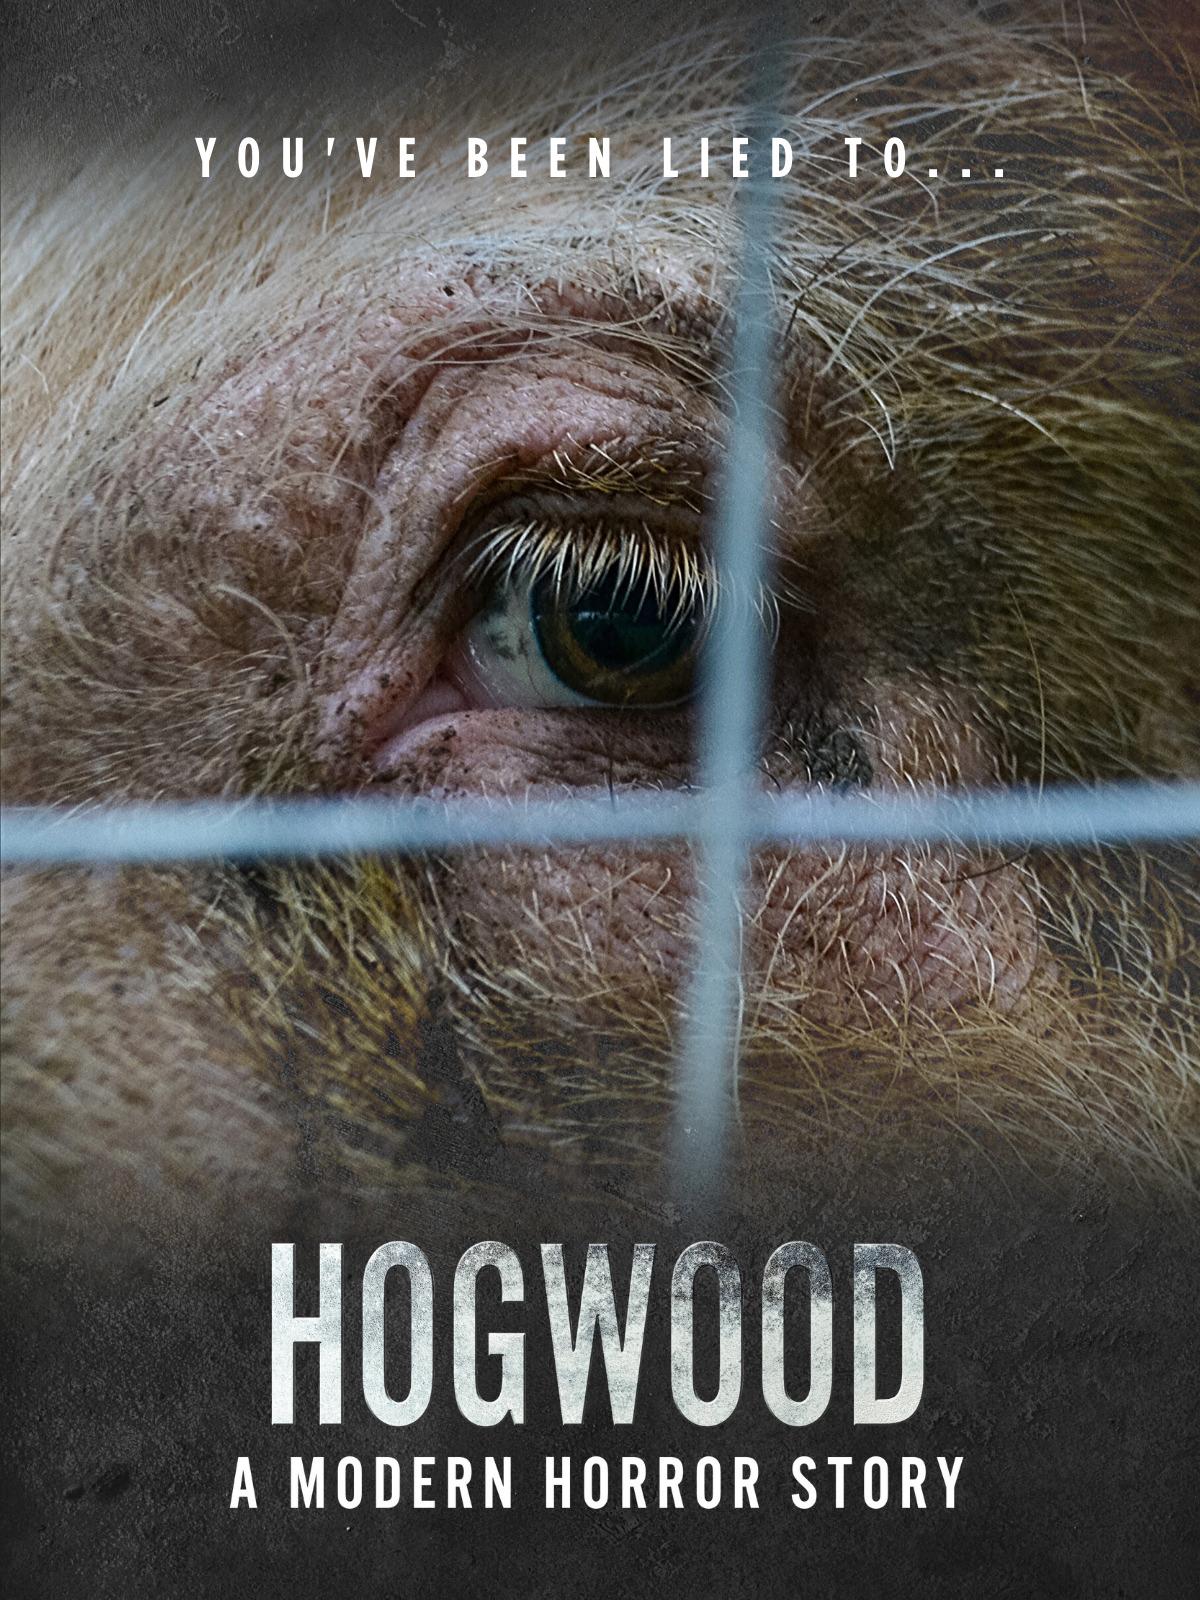 Hogwood: a modern horror story [OV]